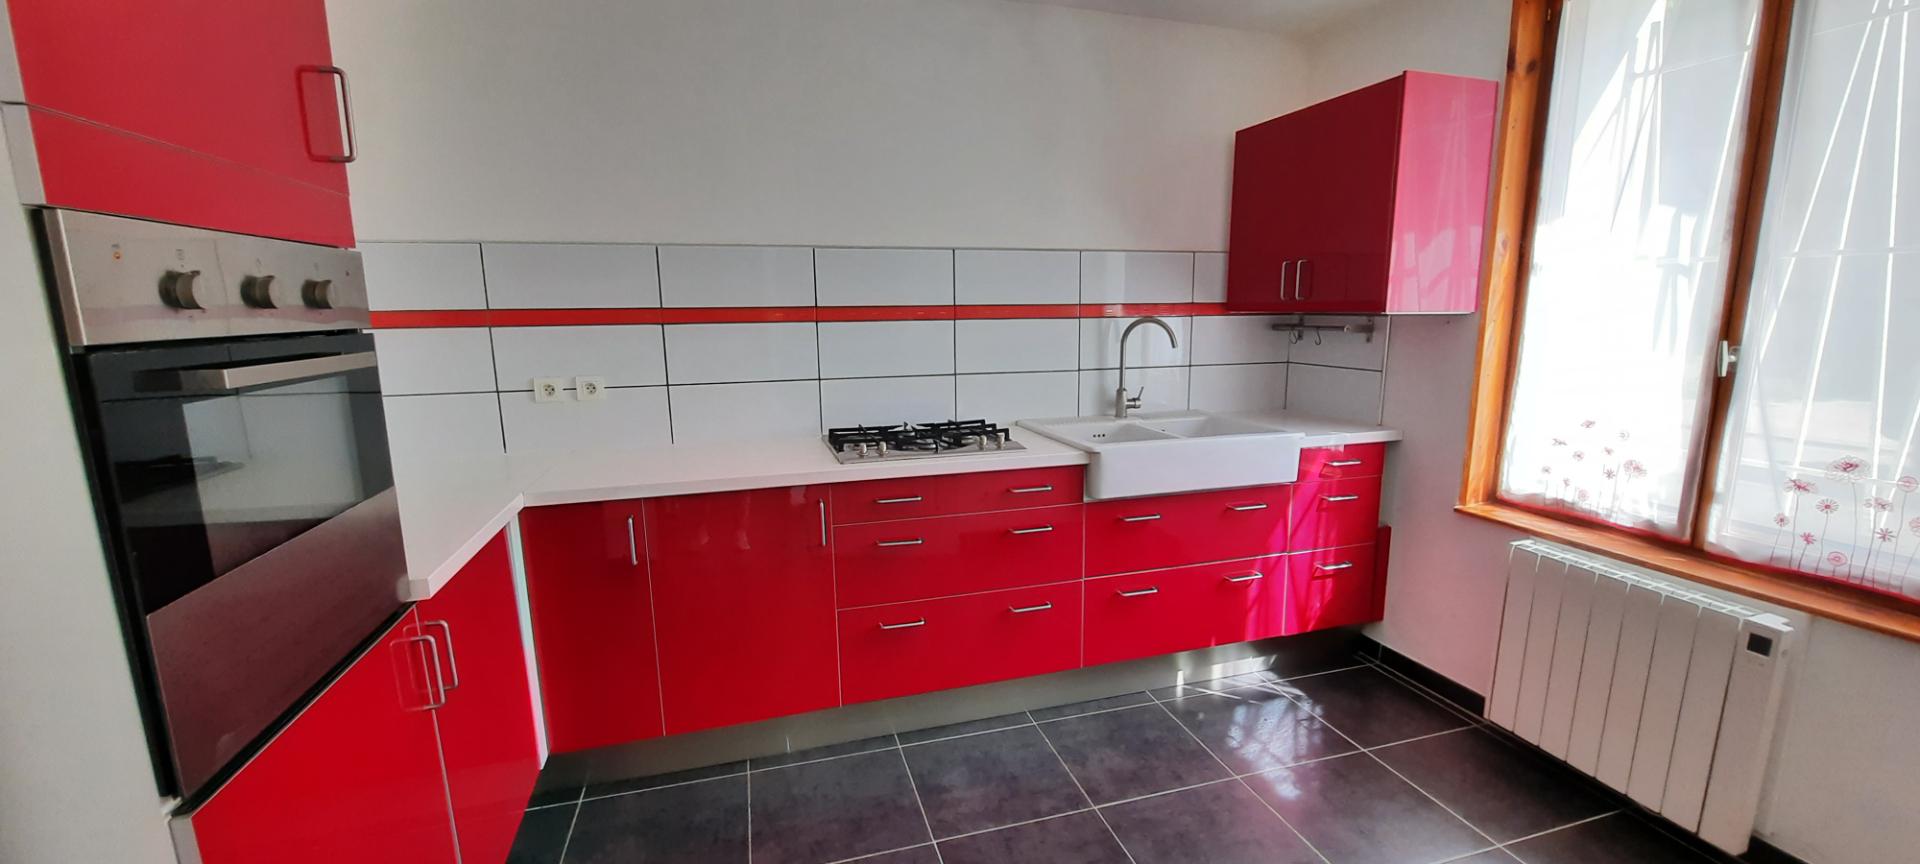 Vente Maison de 4 pièces 91 m² - CASTELNAUDARY 11400 | IMOGROUP CASTELNAUDARY - IMOGROUP photo2